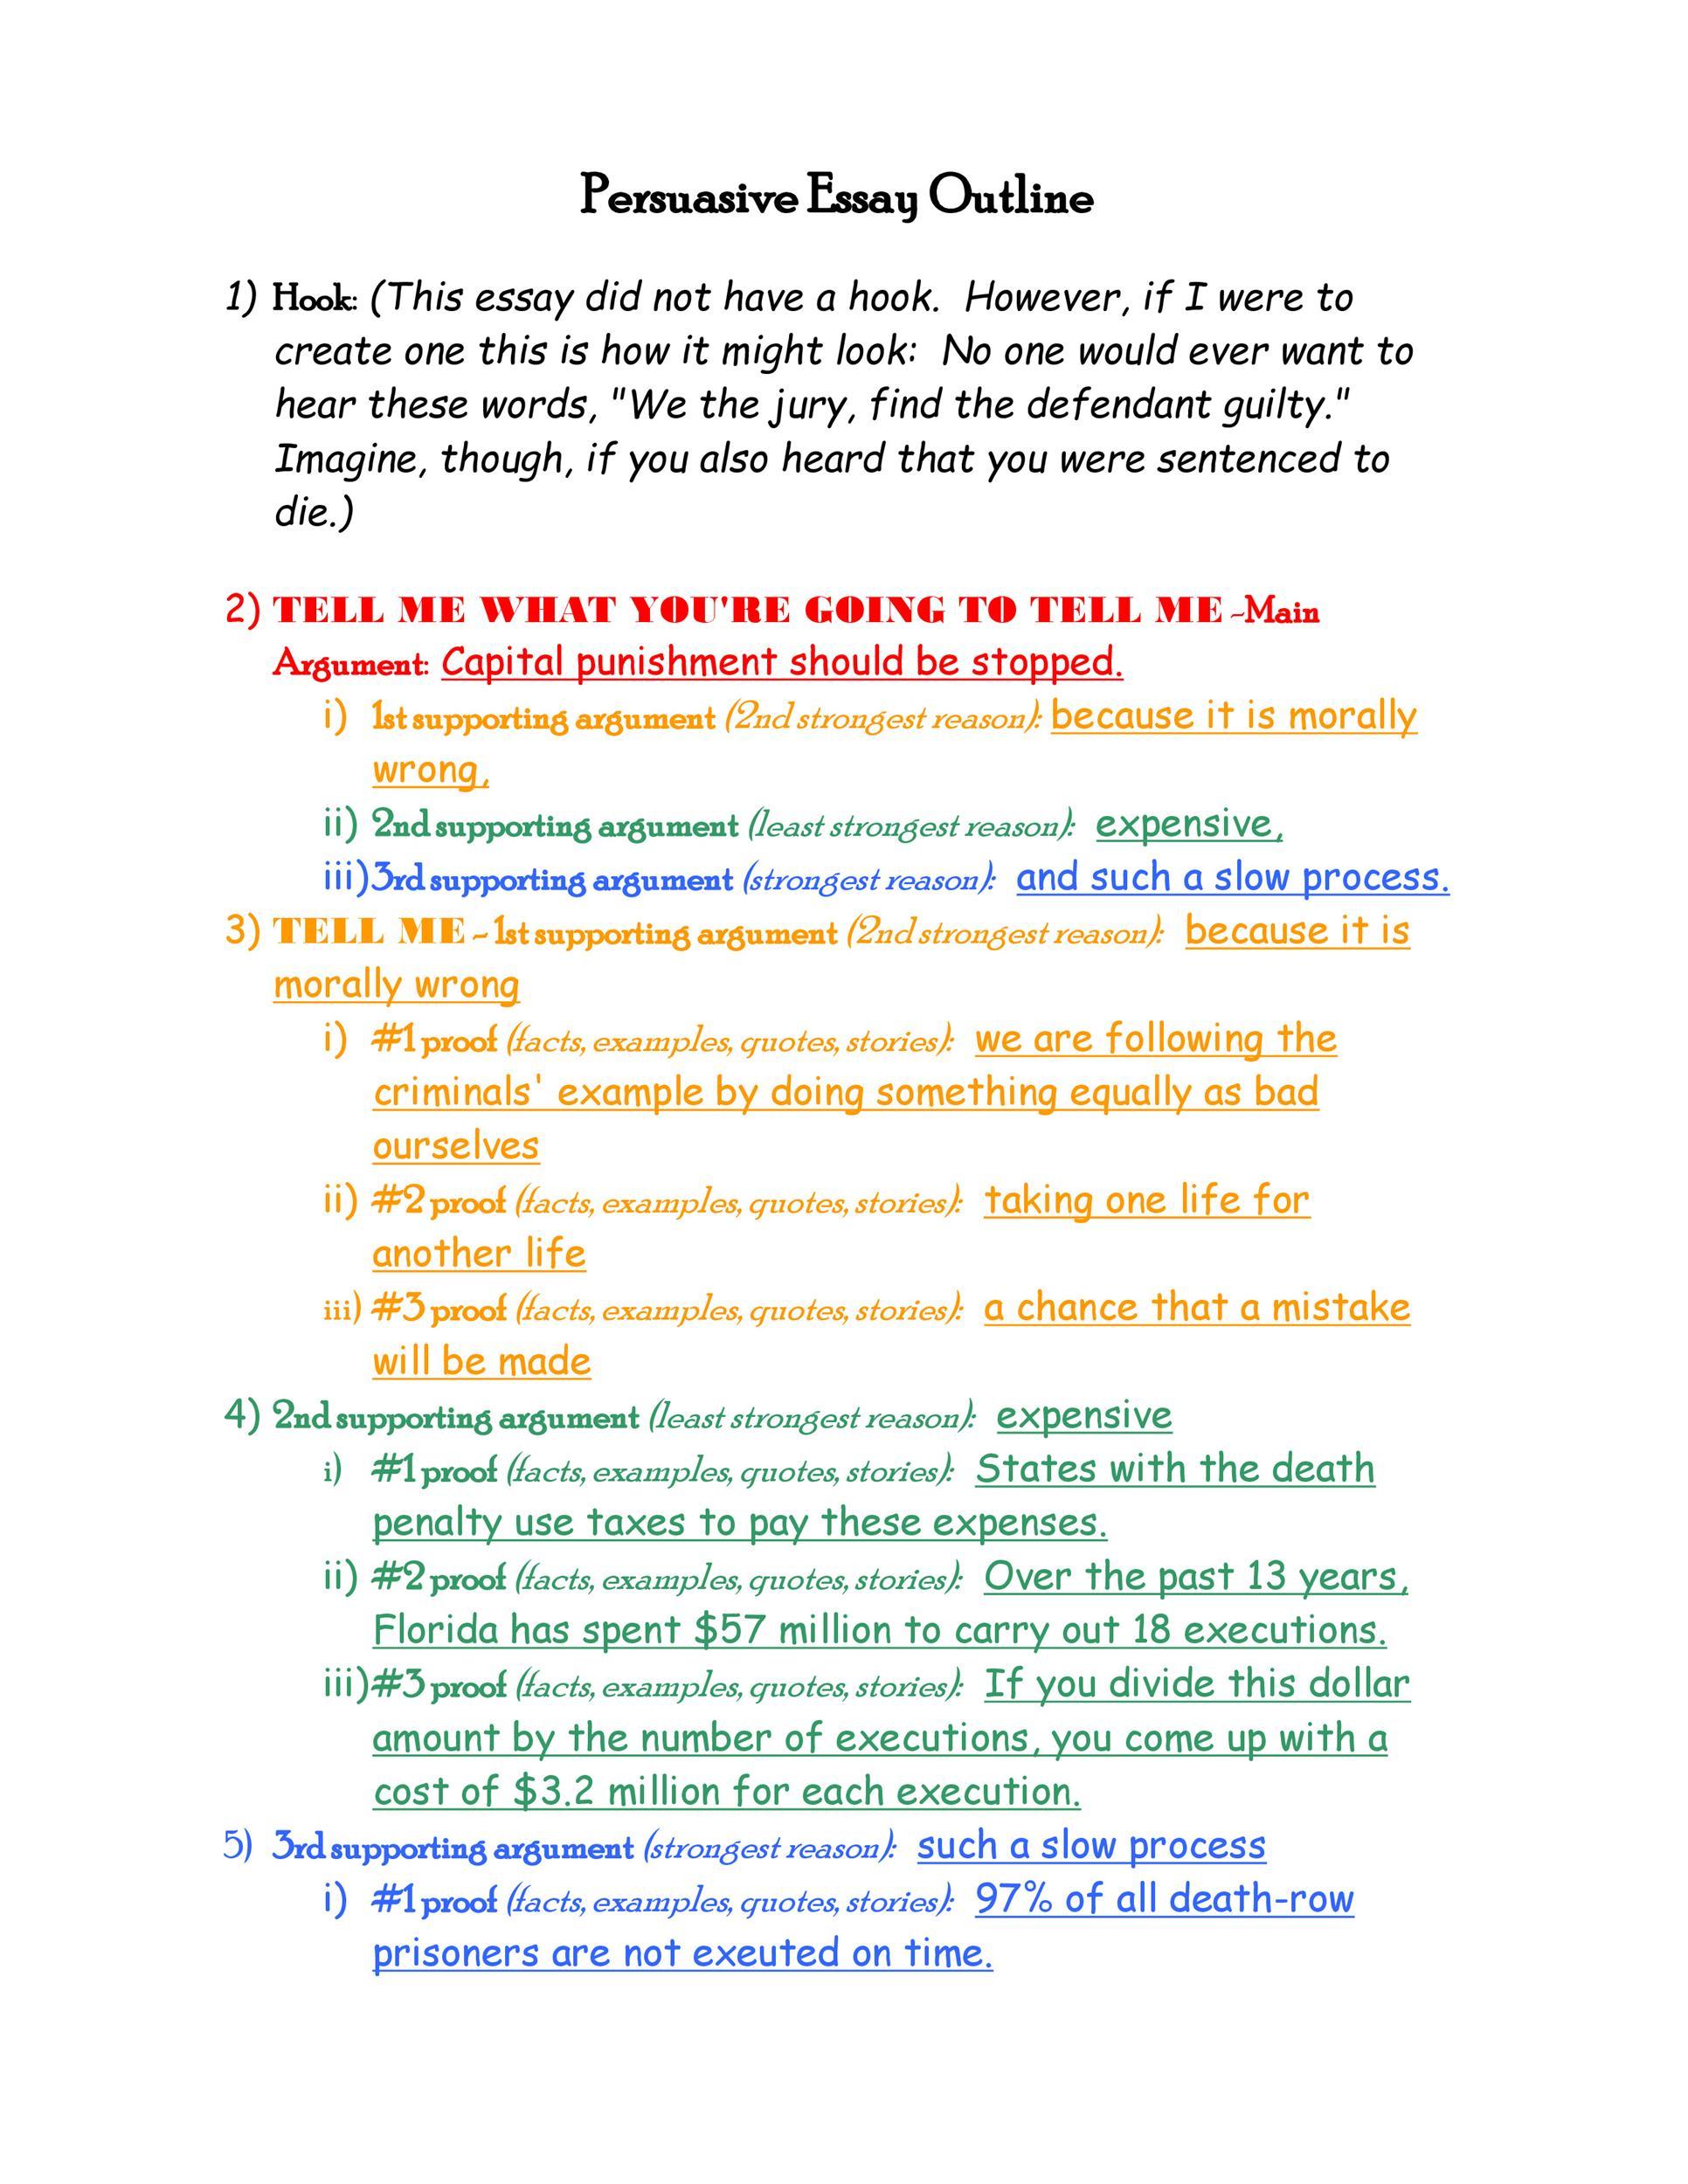 Persuasive Essay Layout